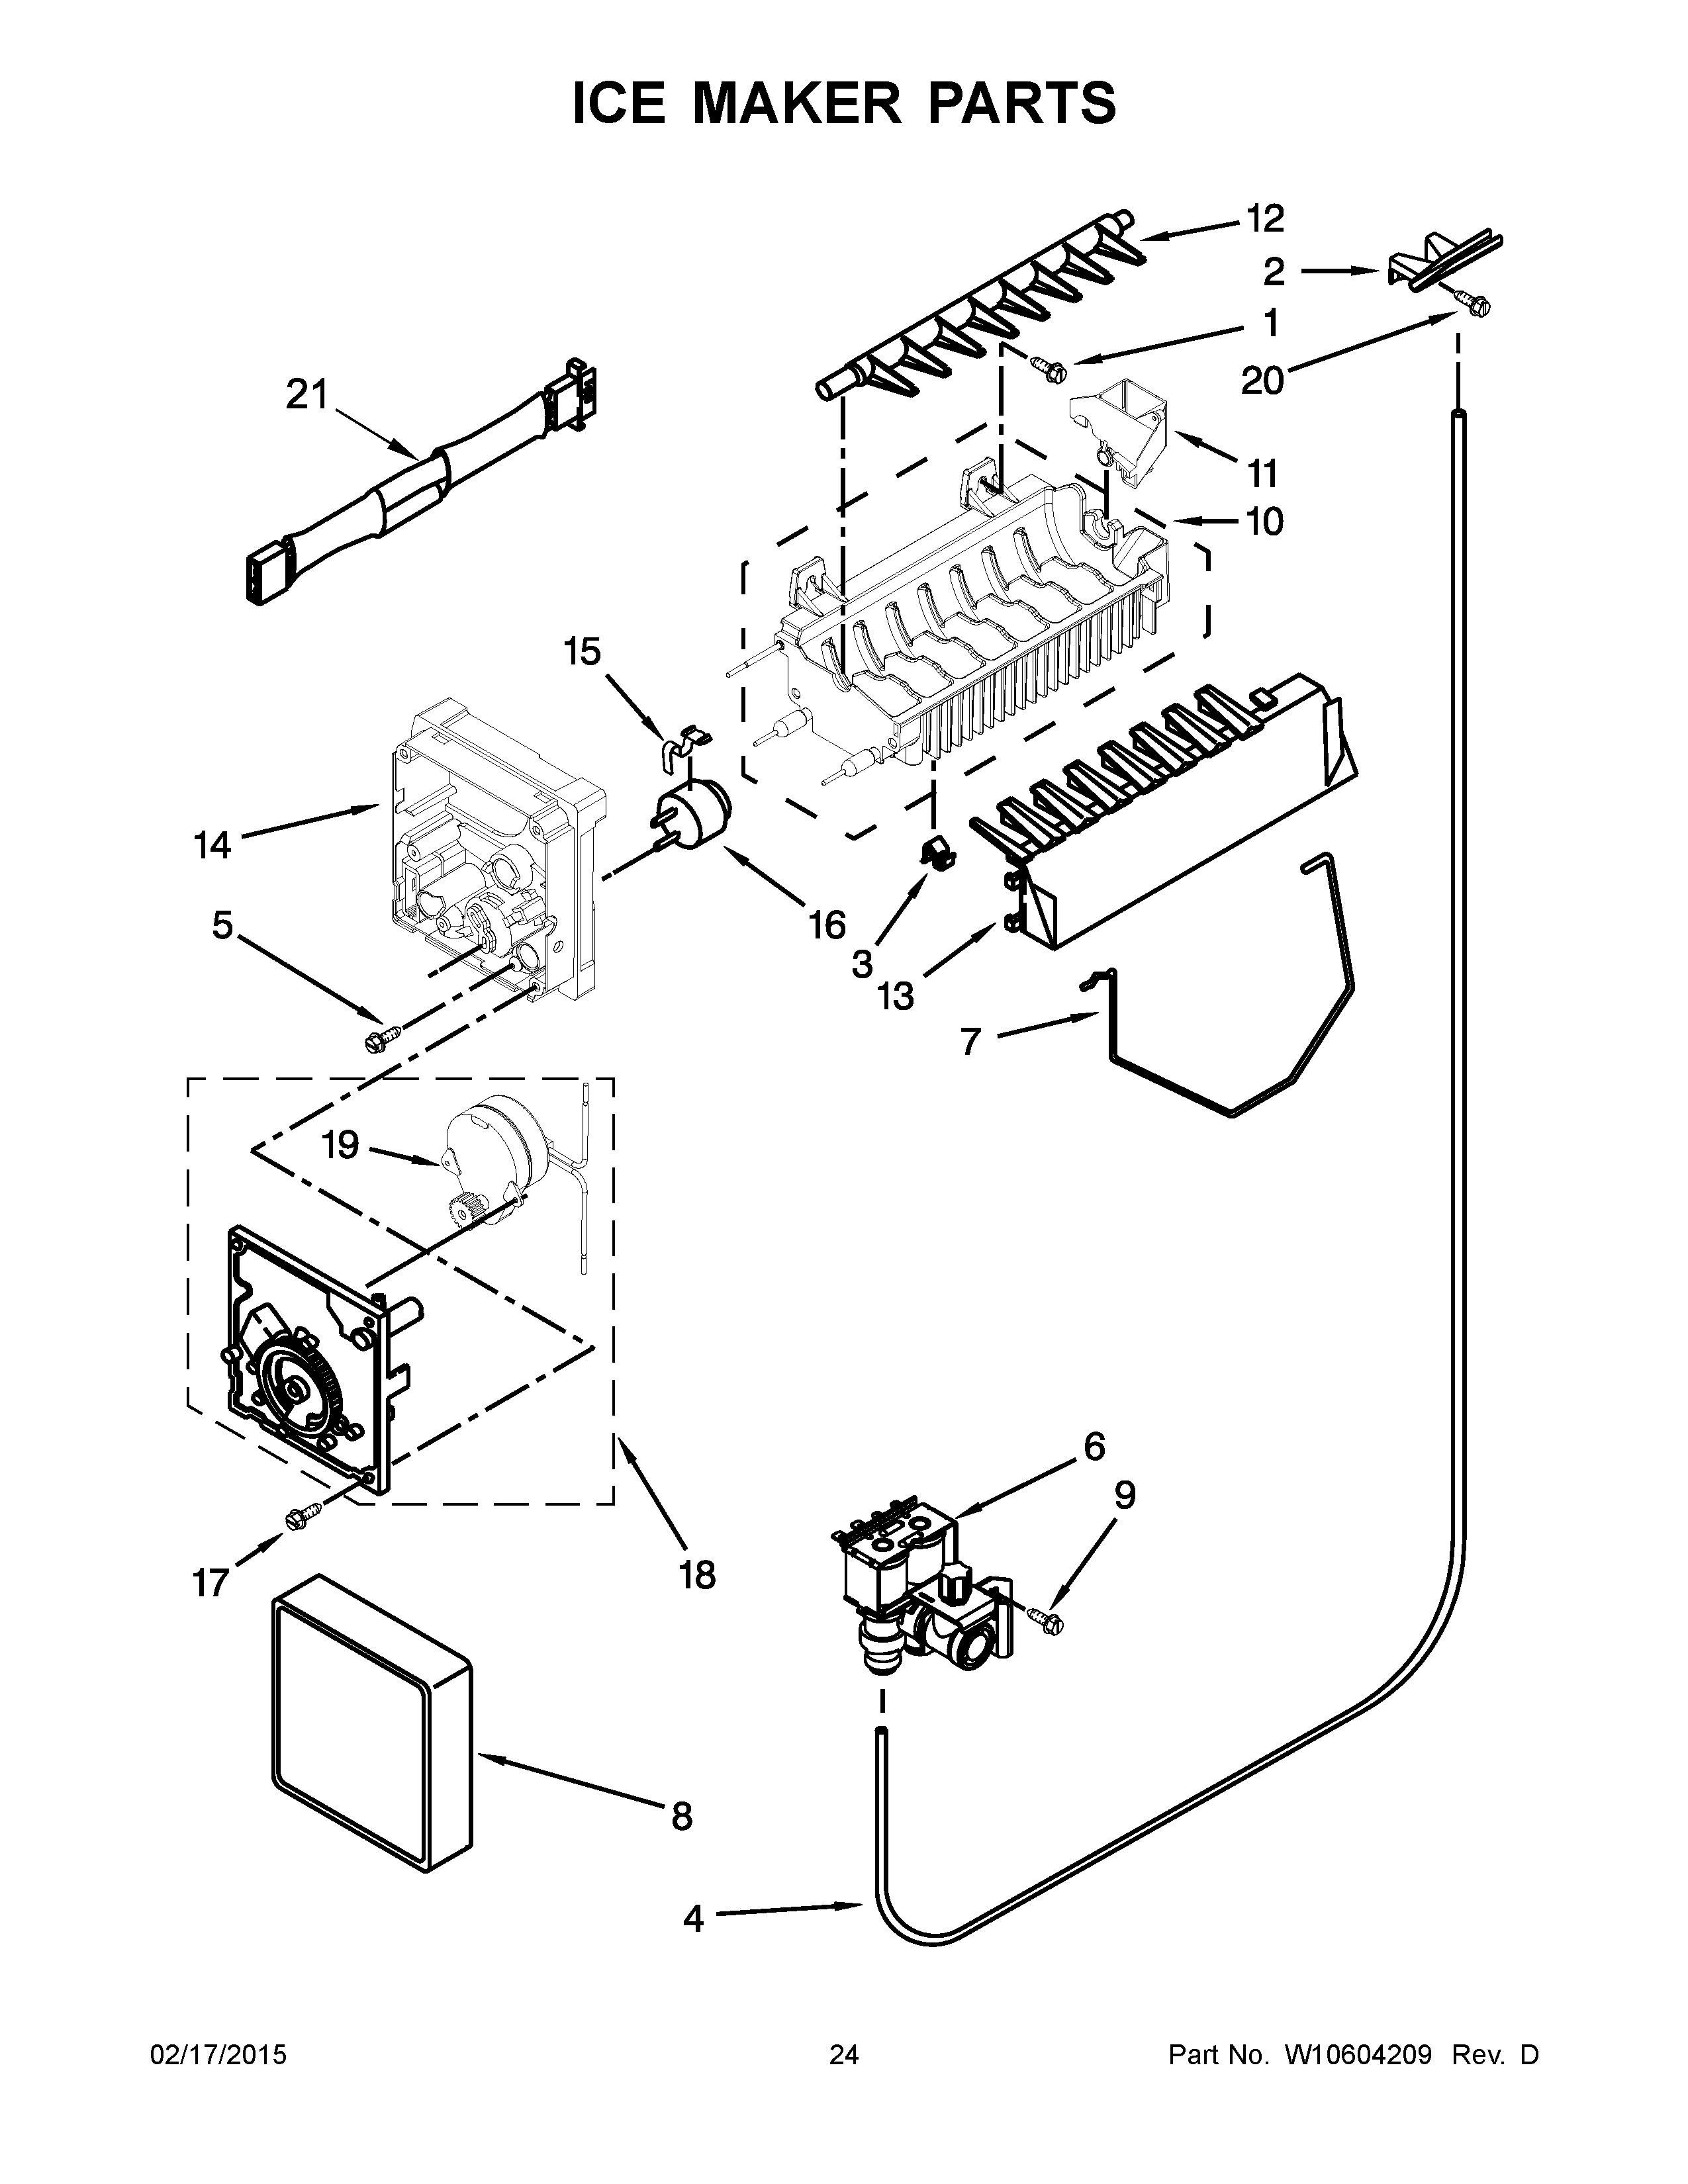 Whirlpool Refrigerator Ice Maker Wiring Diagram